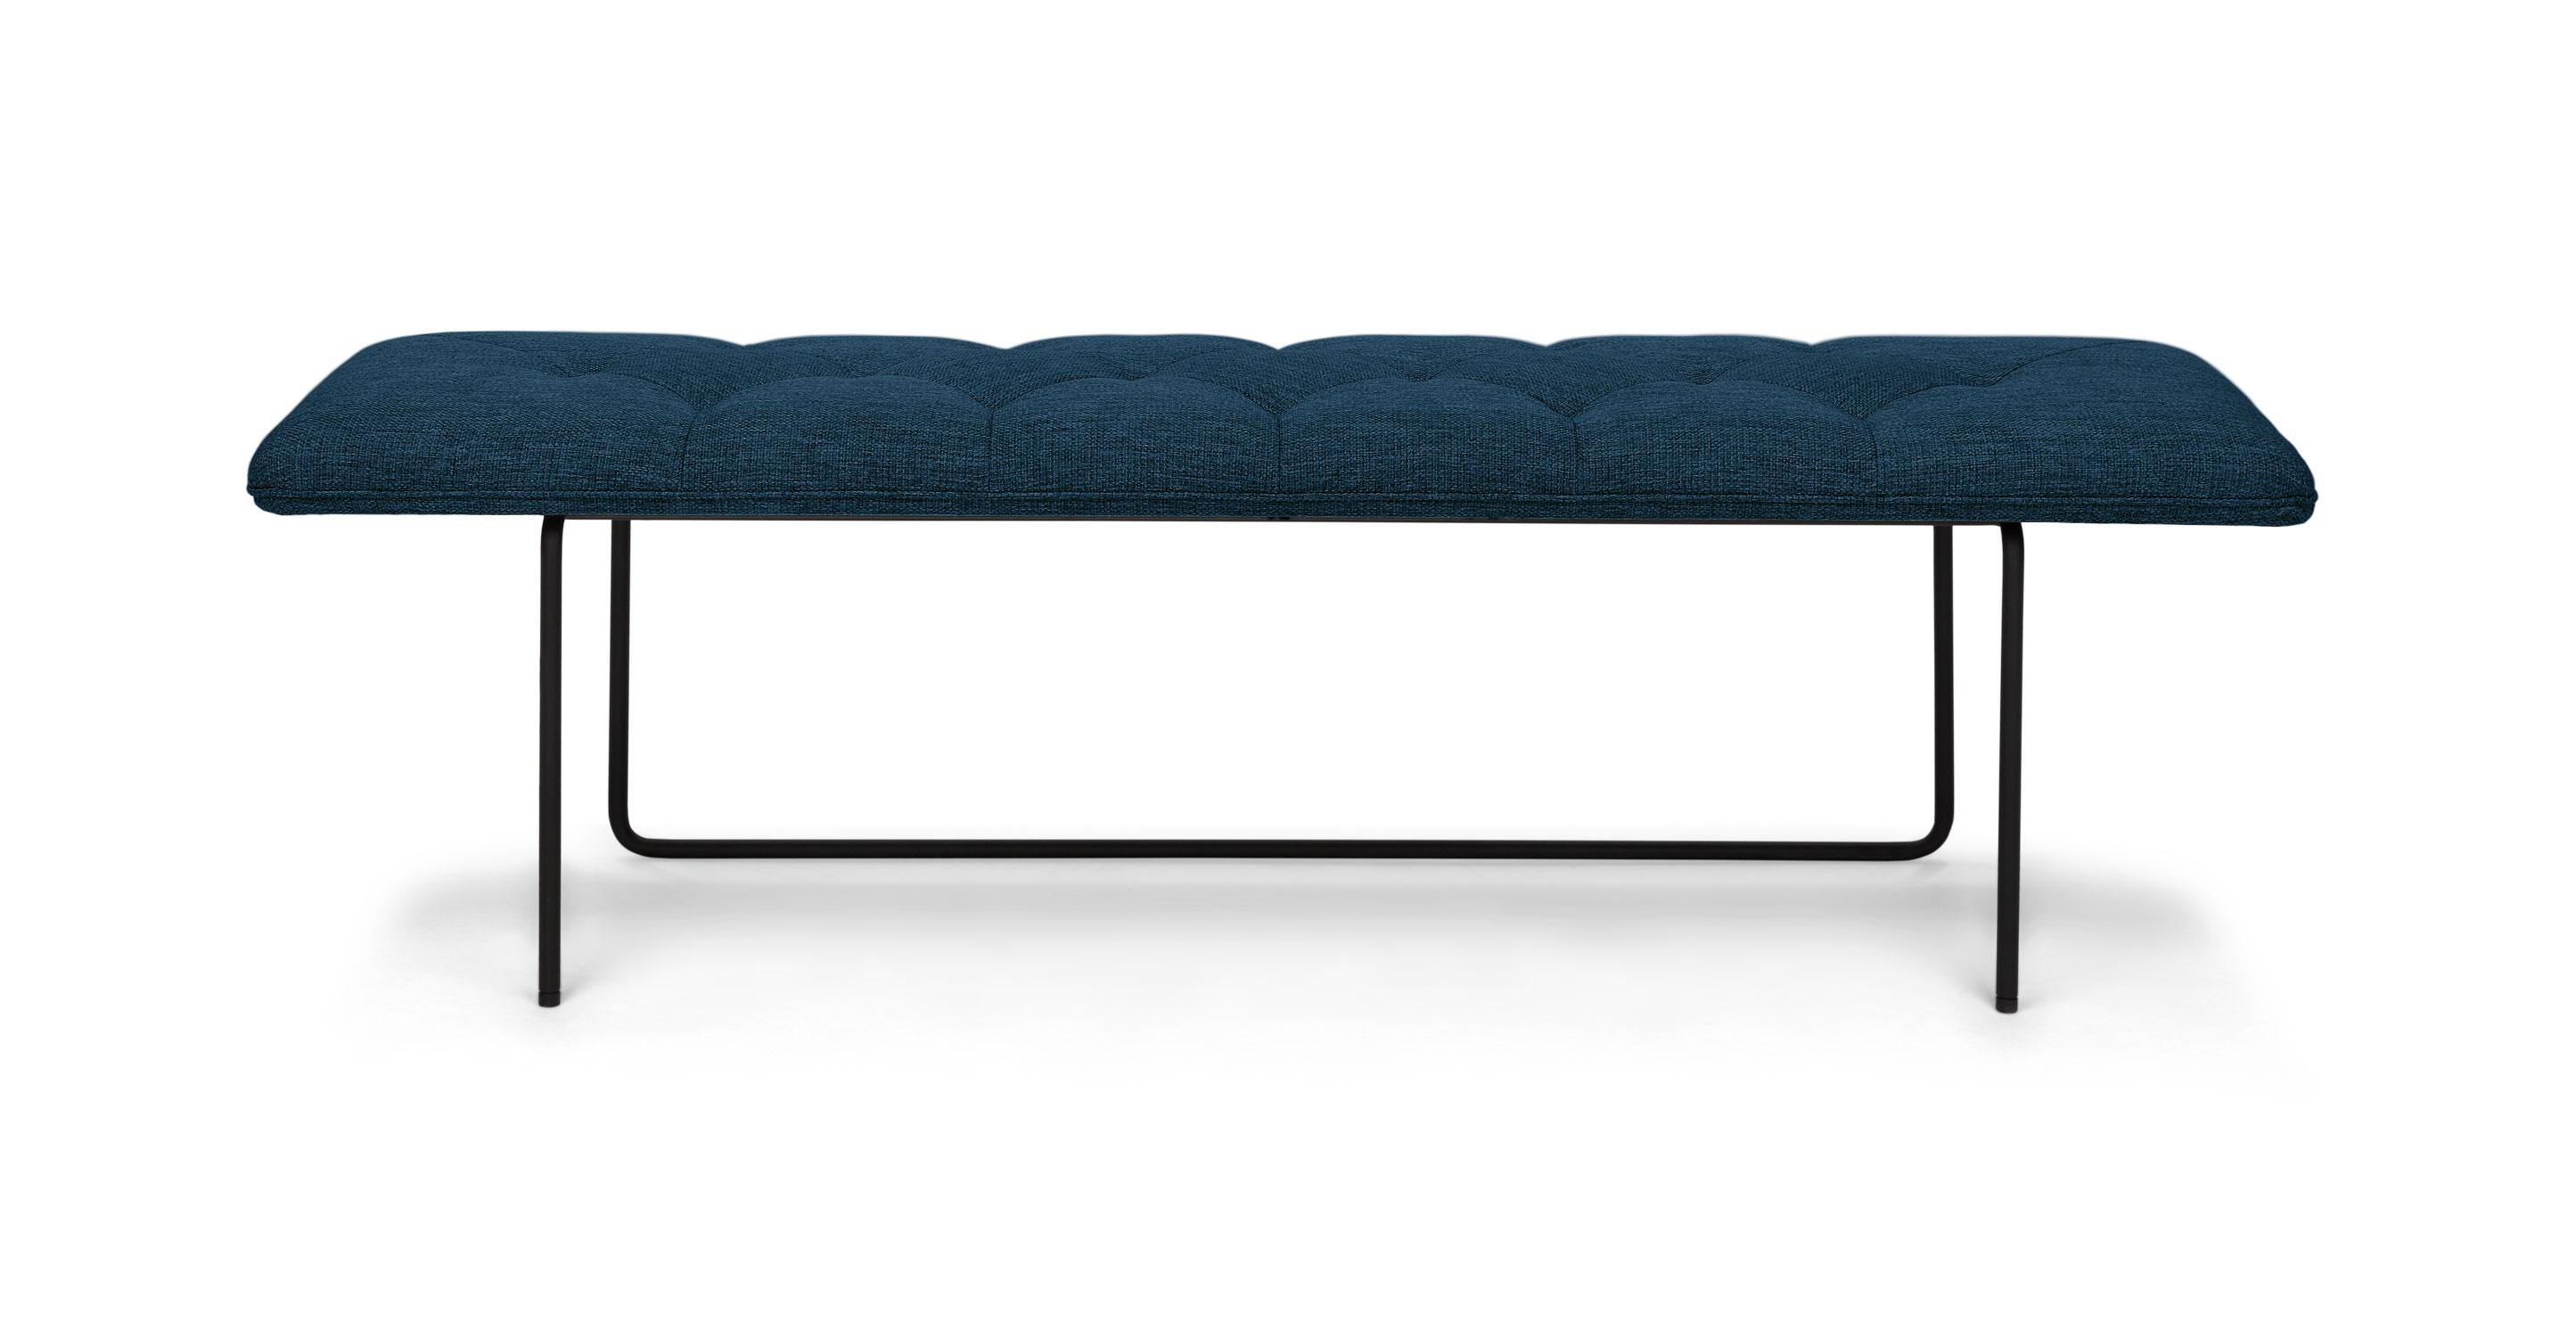 Horizon Twilight Blue Bench Benches Article Modern Mid Century And Scandinavian Furniture